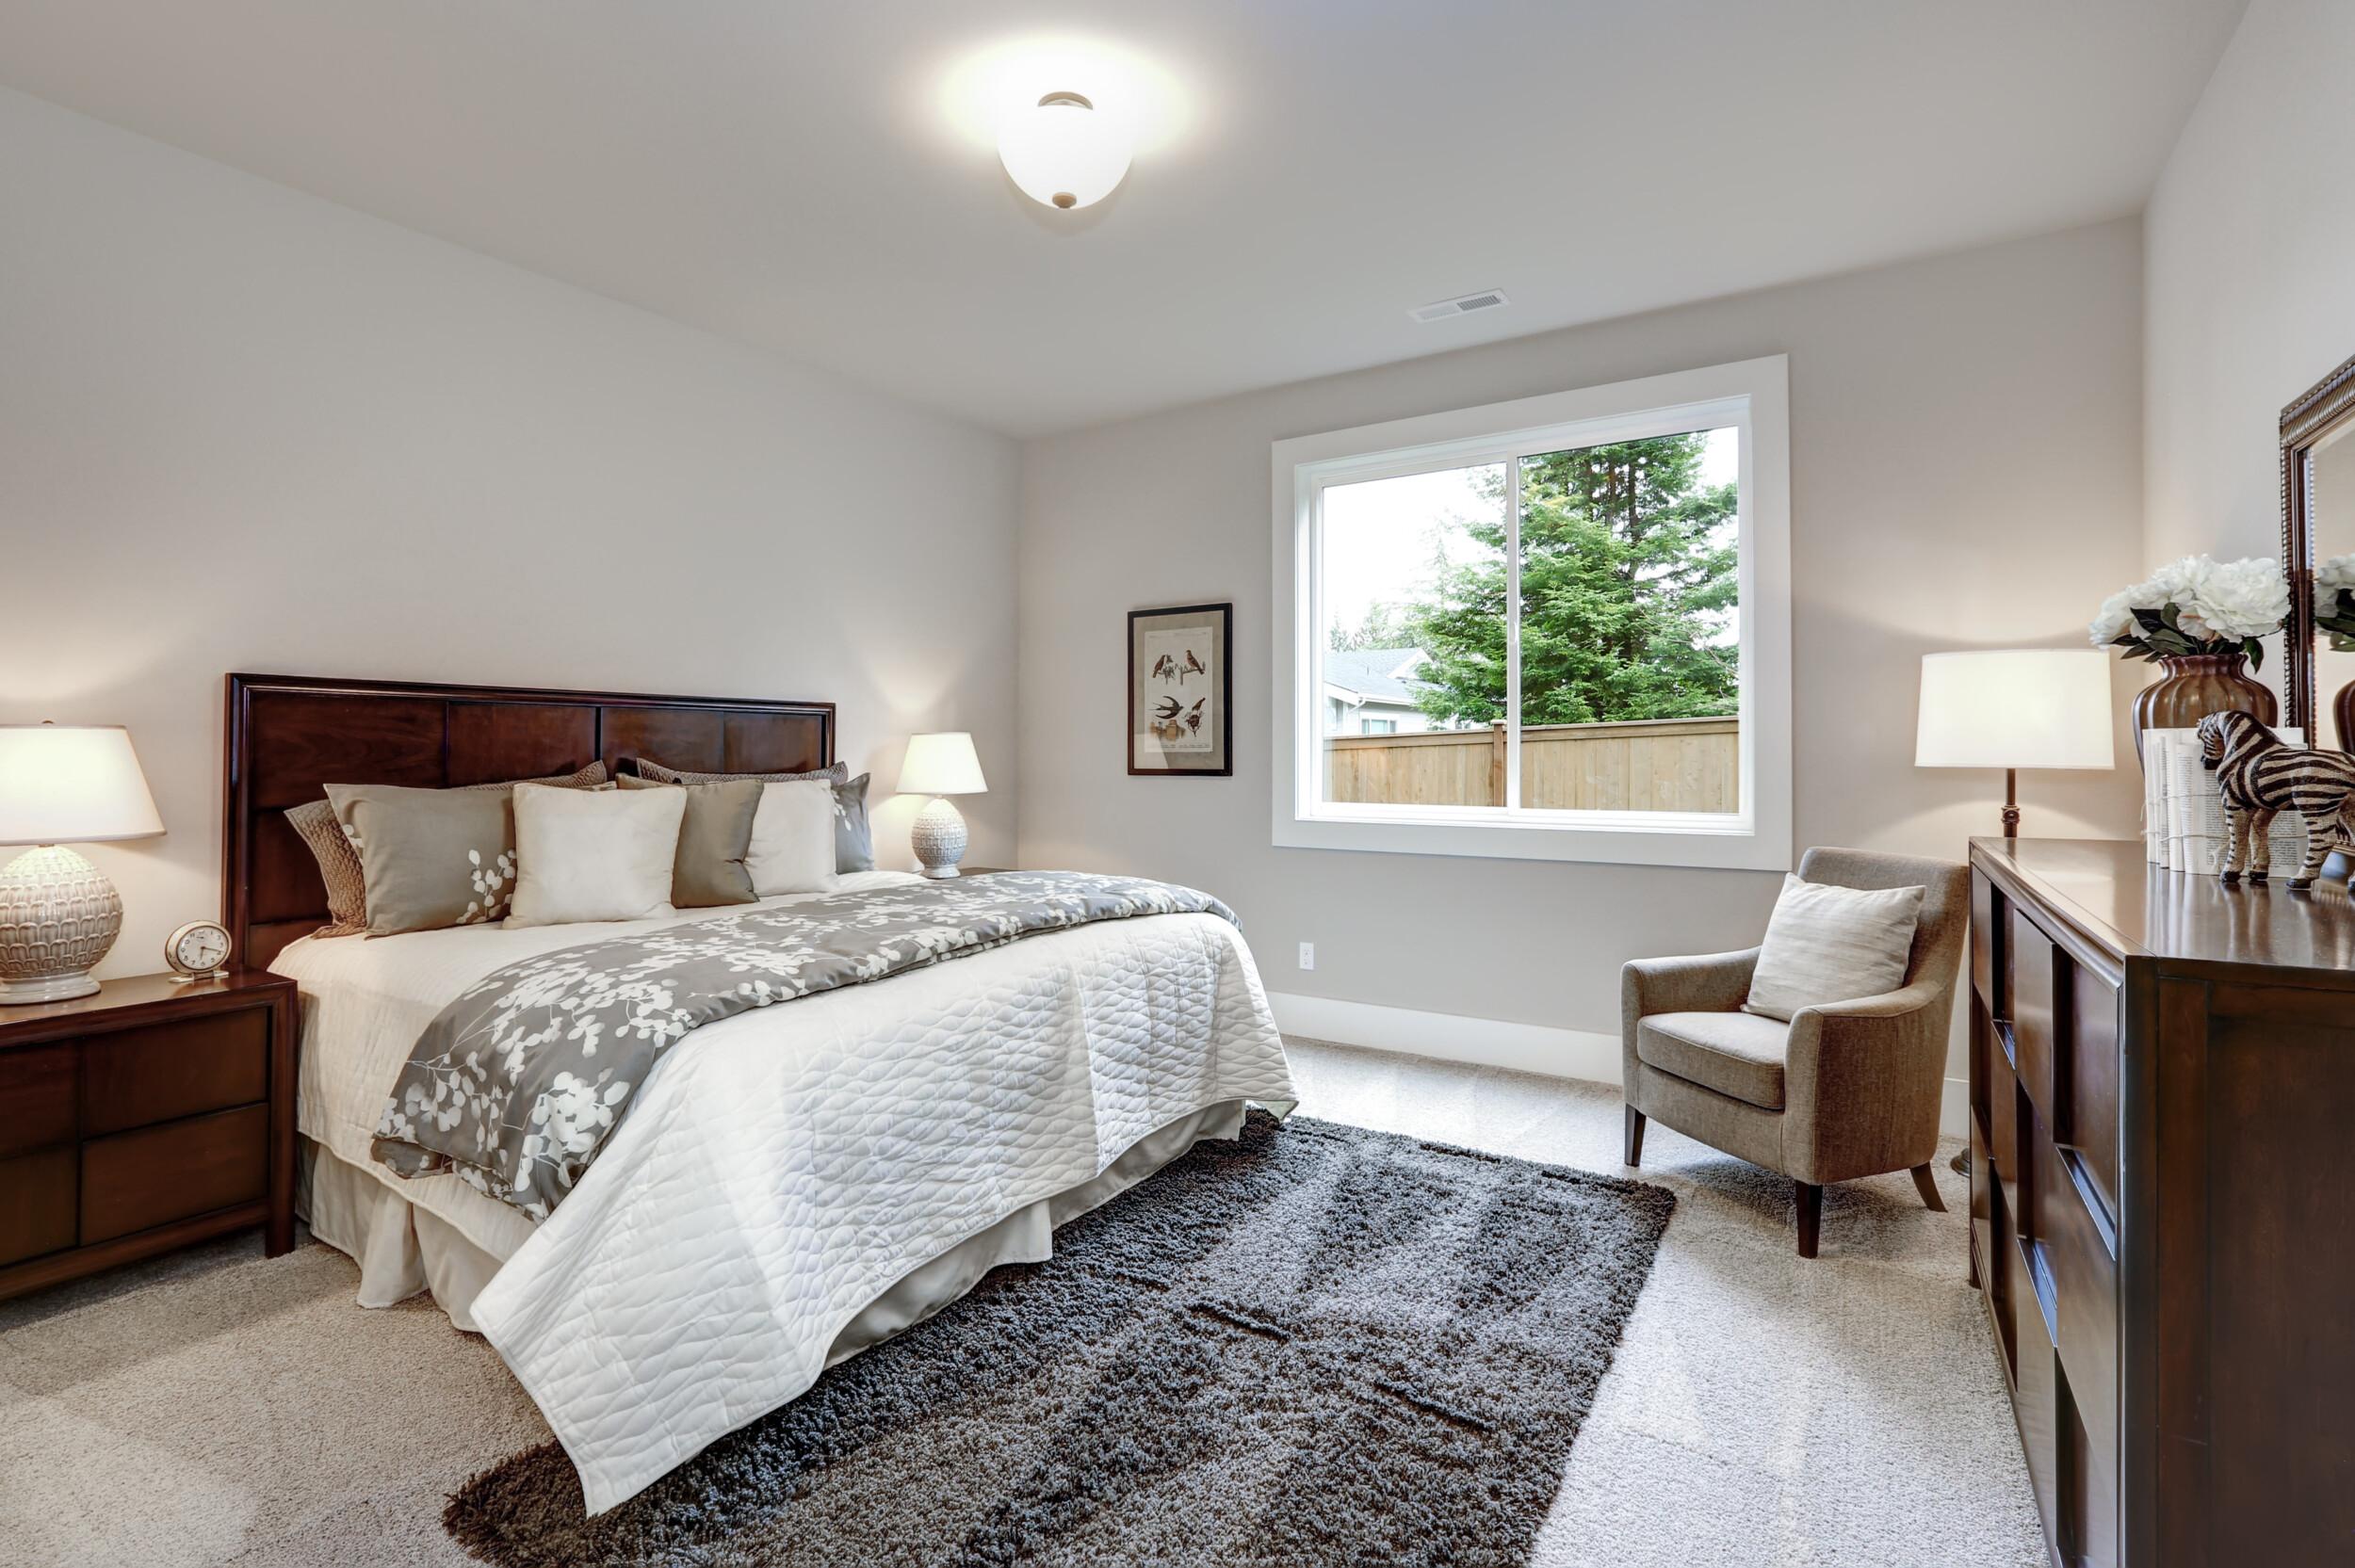 bedroom bedding idea